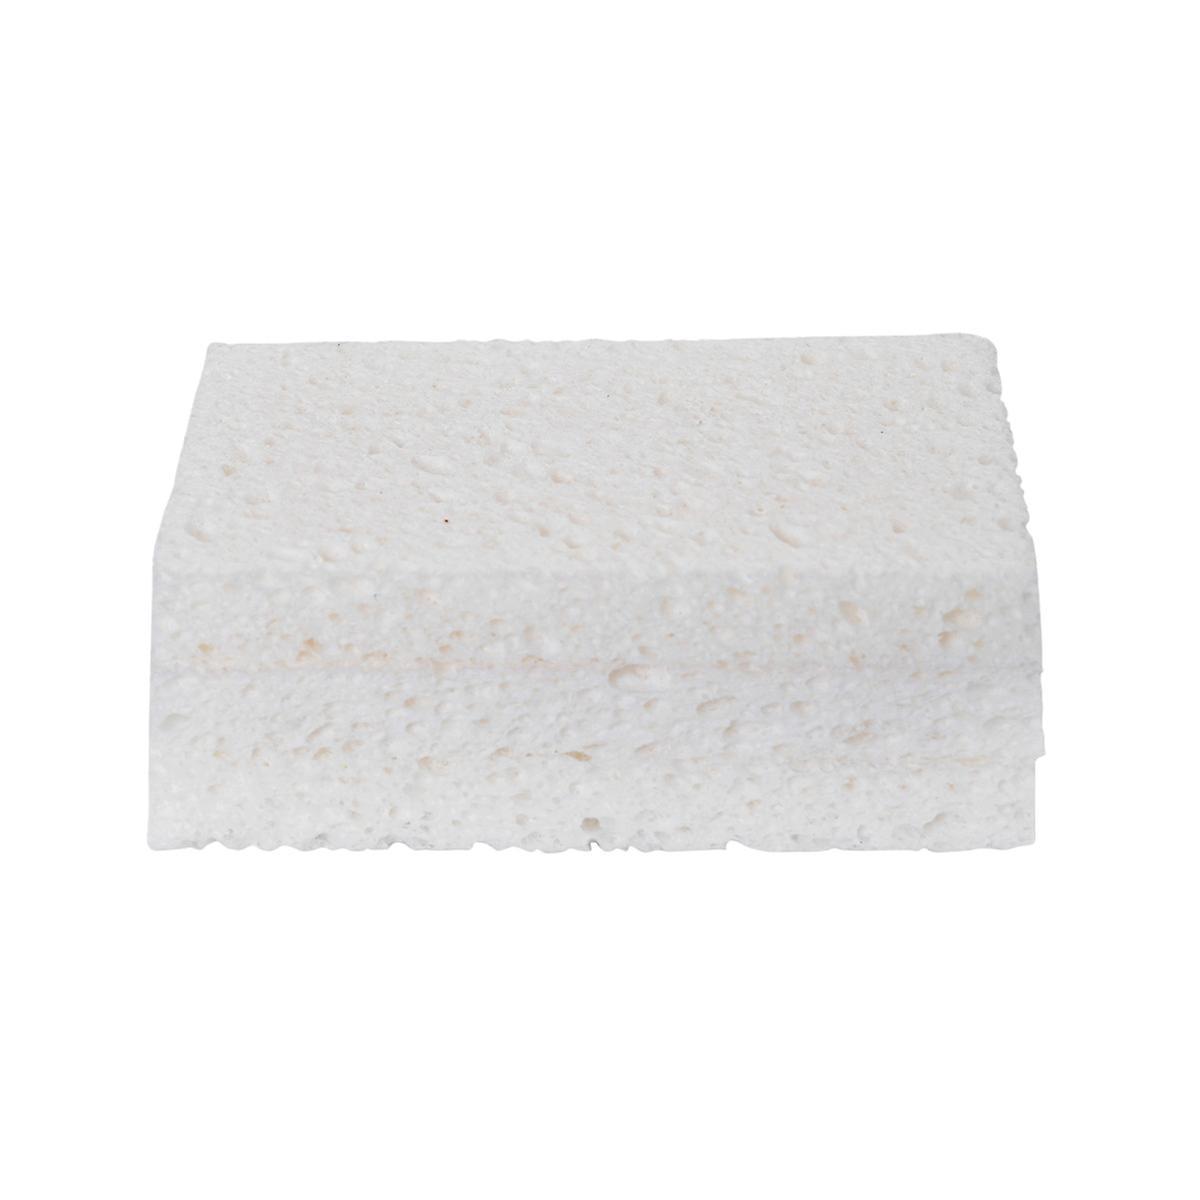 Full Circle Plain Jane Cellulose Sponge